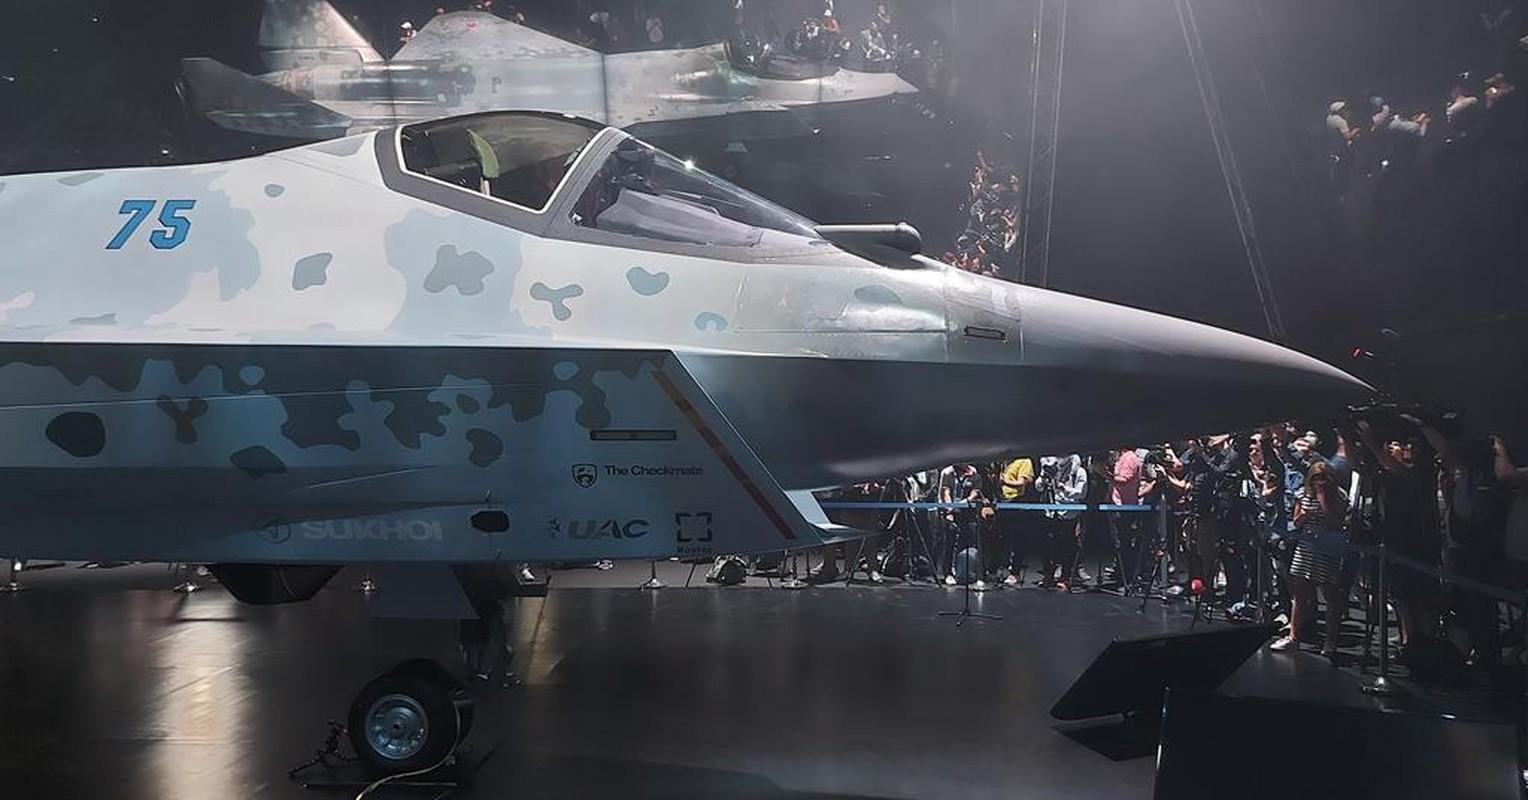 Tiem kich Su-75 se khong the co gia 30 trieu USD nhu quang cao-Hinh-5